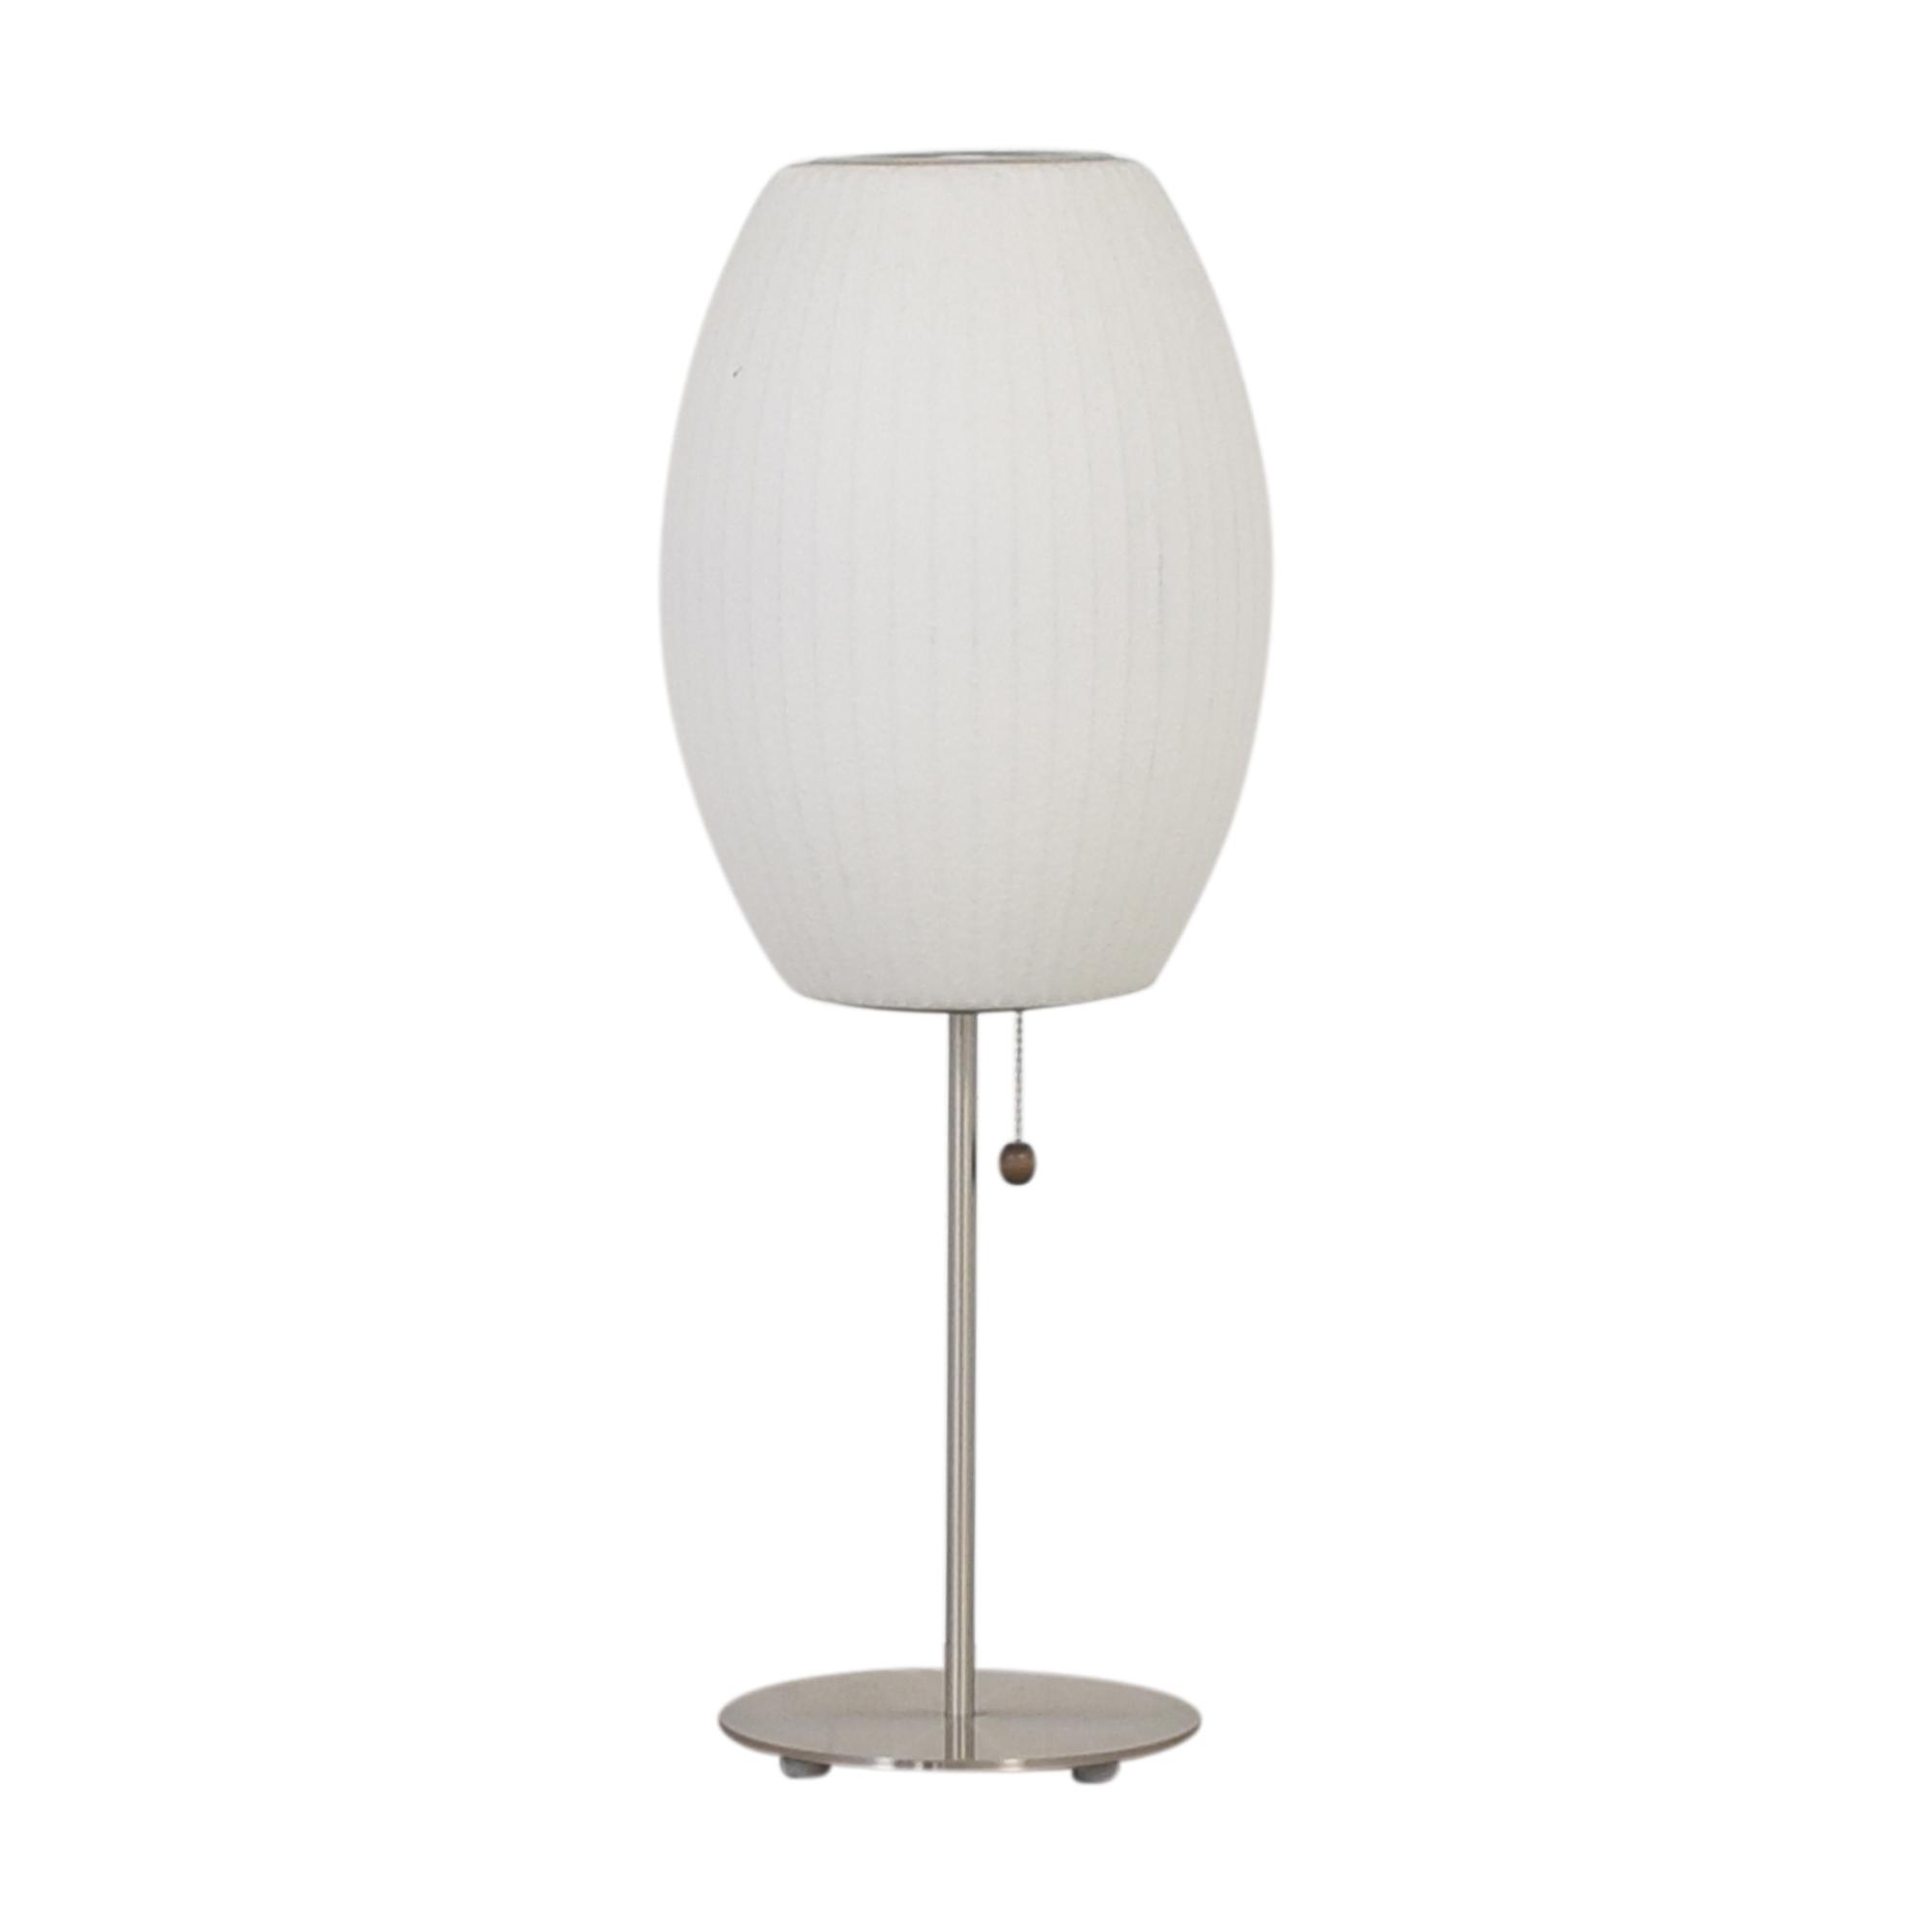 Modernica Modernica Nelson Bubble Lamps Cigar Lotus Table Lamp Decor